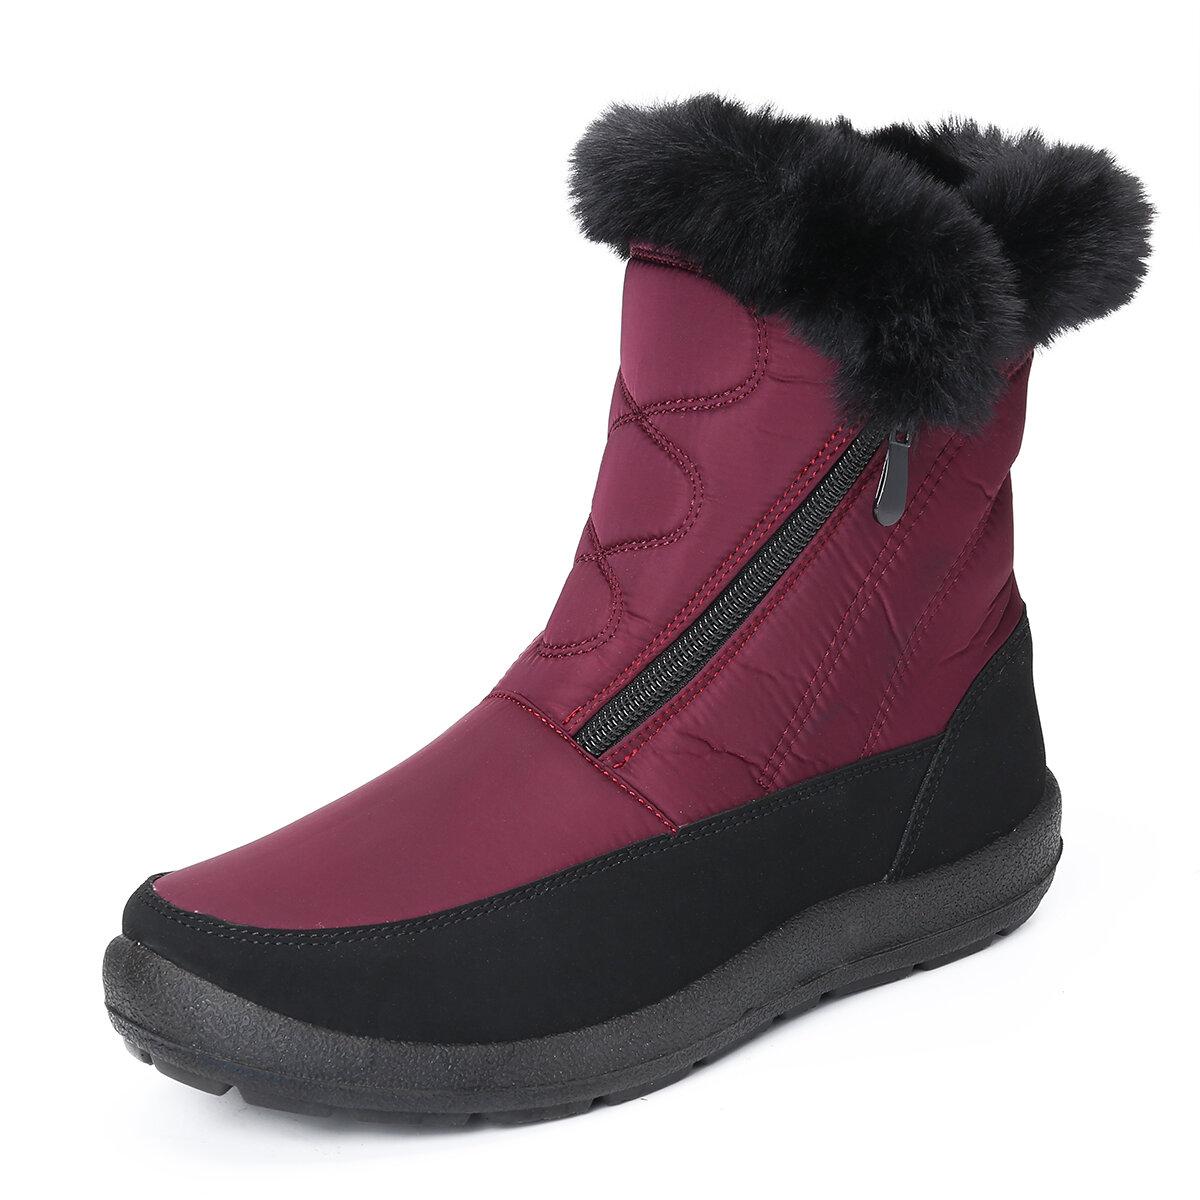 Large Size Women Warm Plush Lined Waterproof Snow Boots